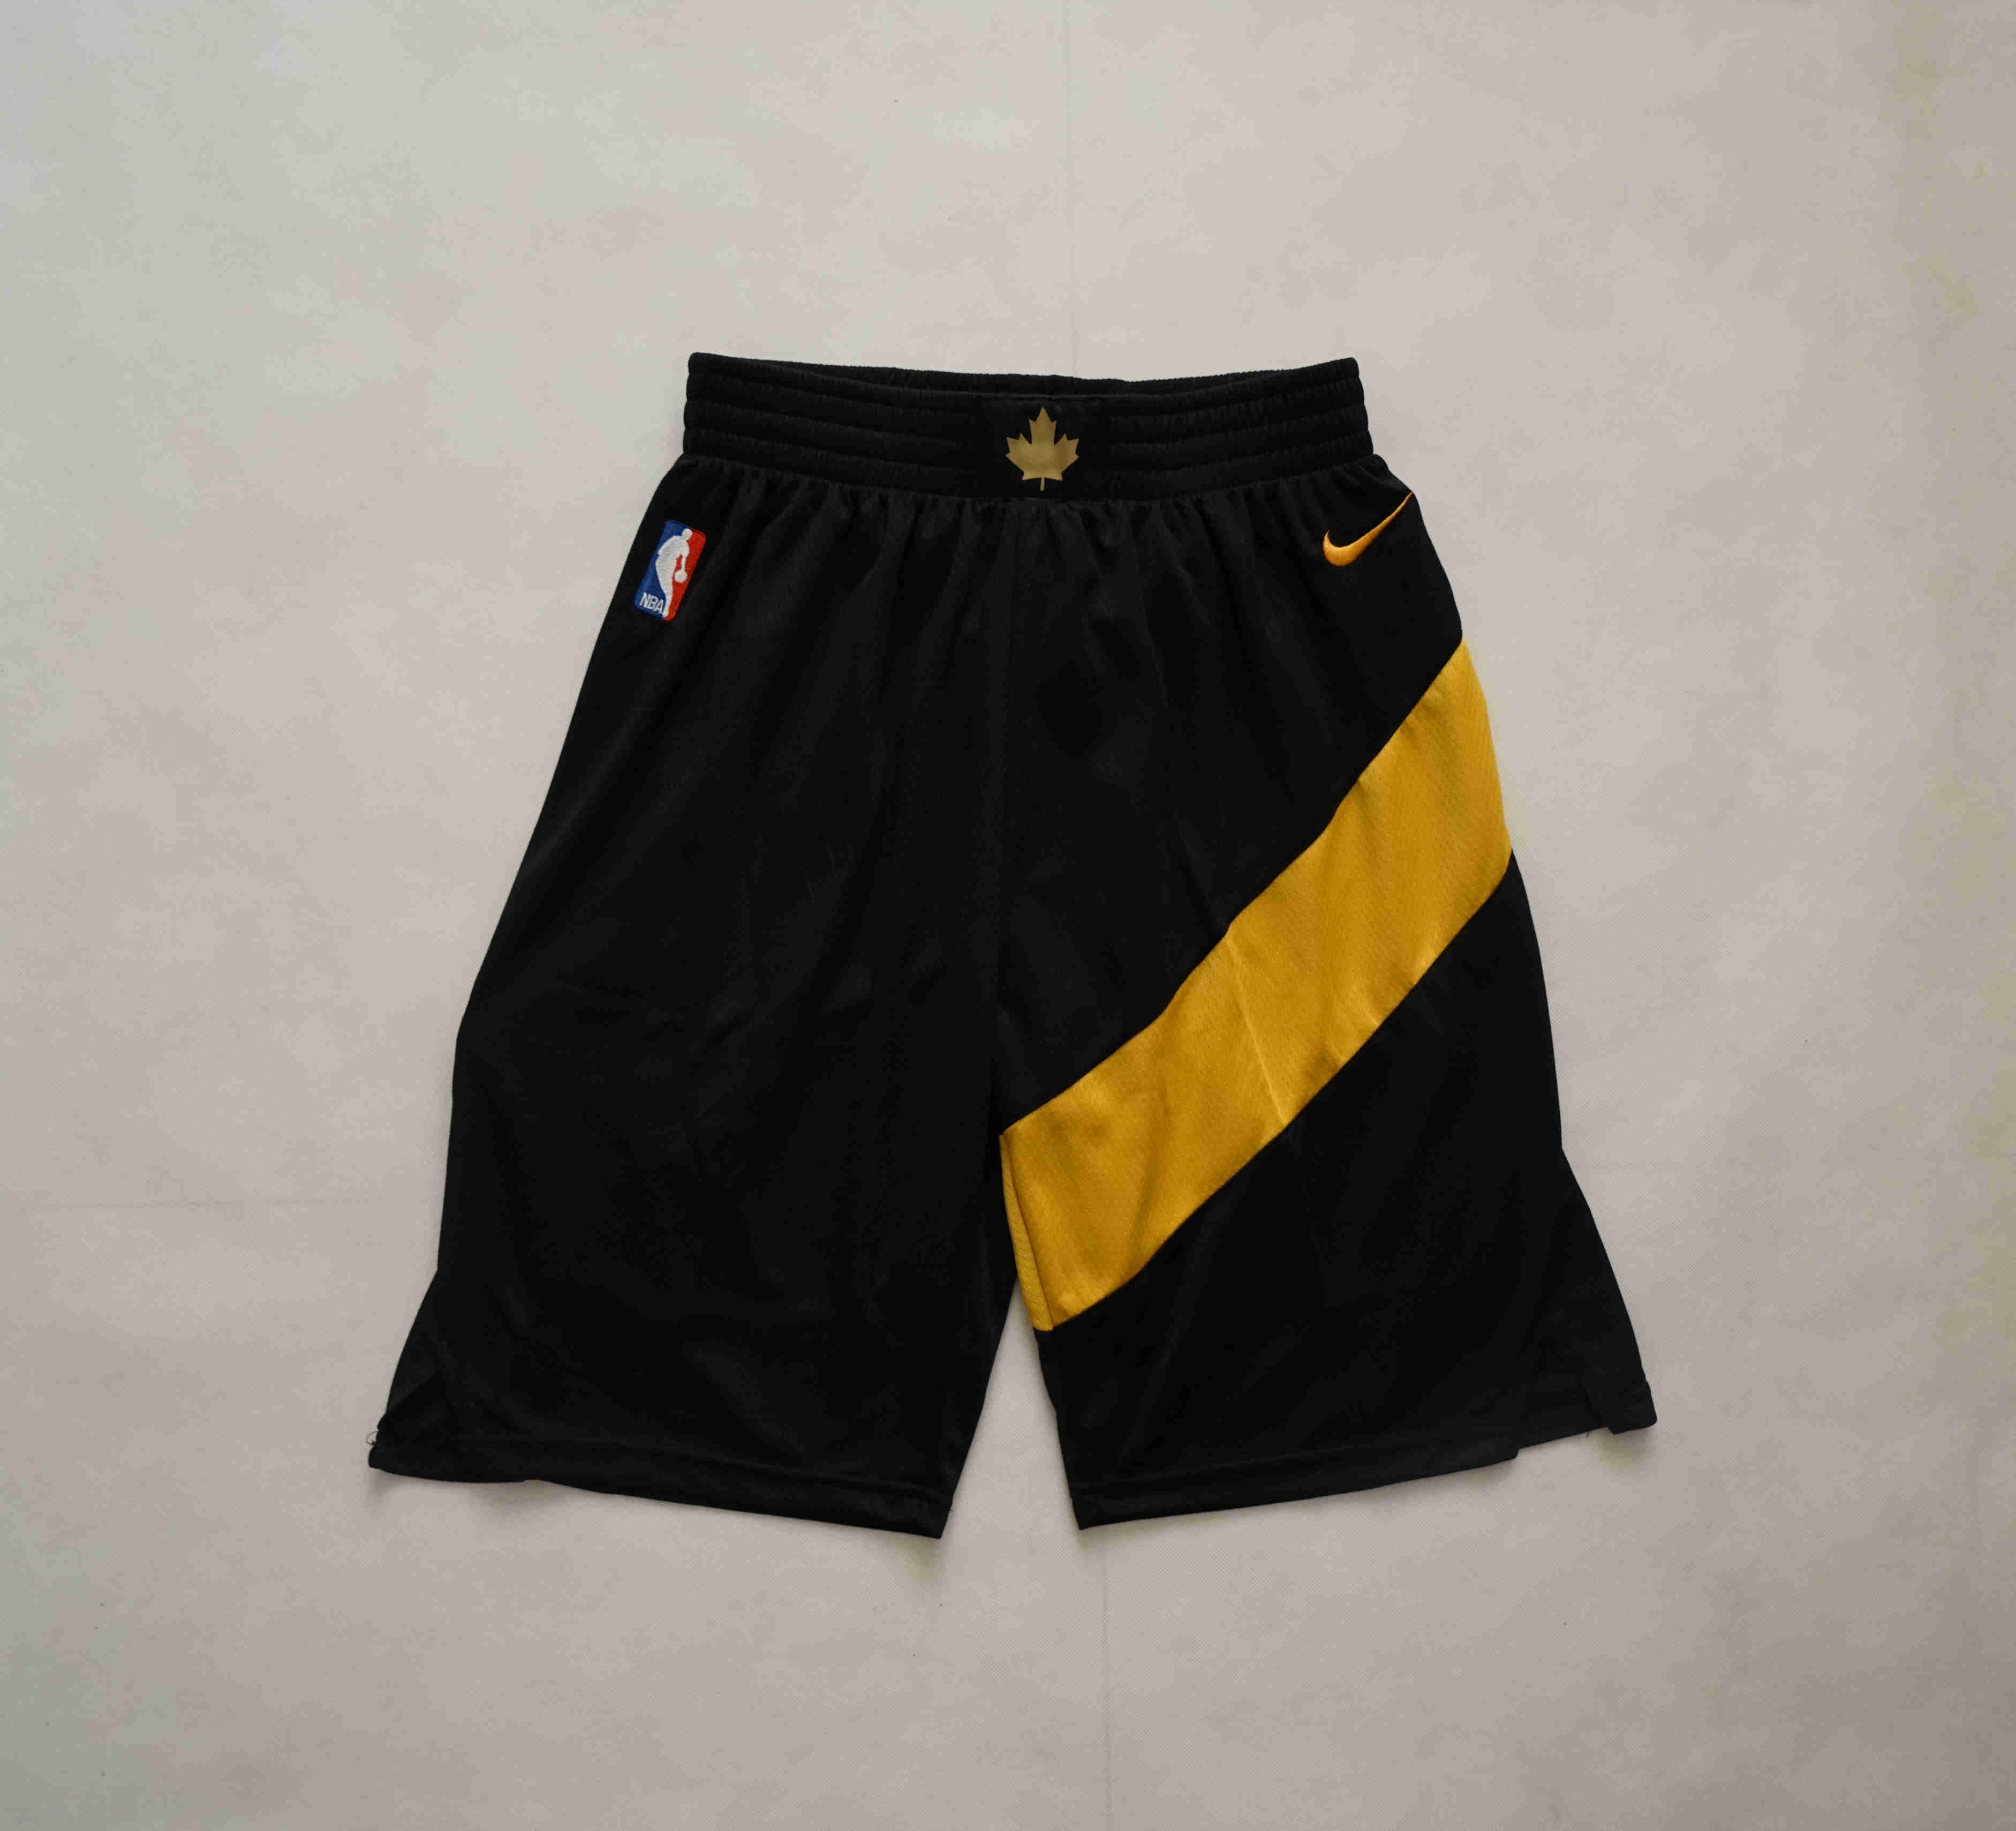 Raptors Black City Edition Shorts